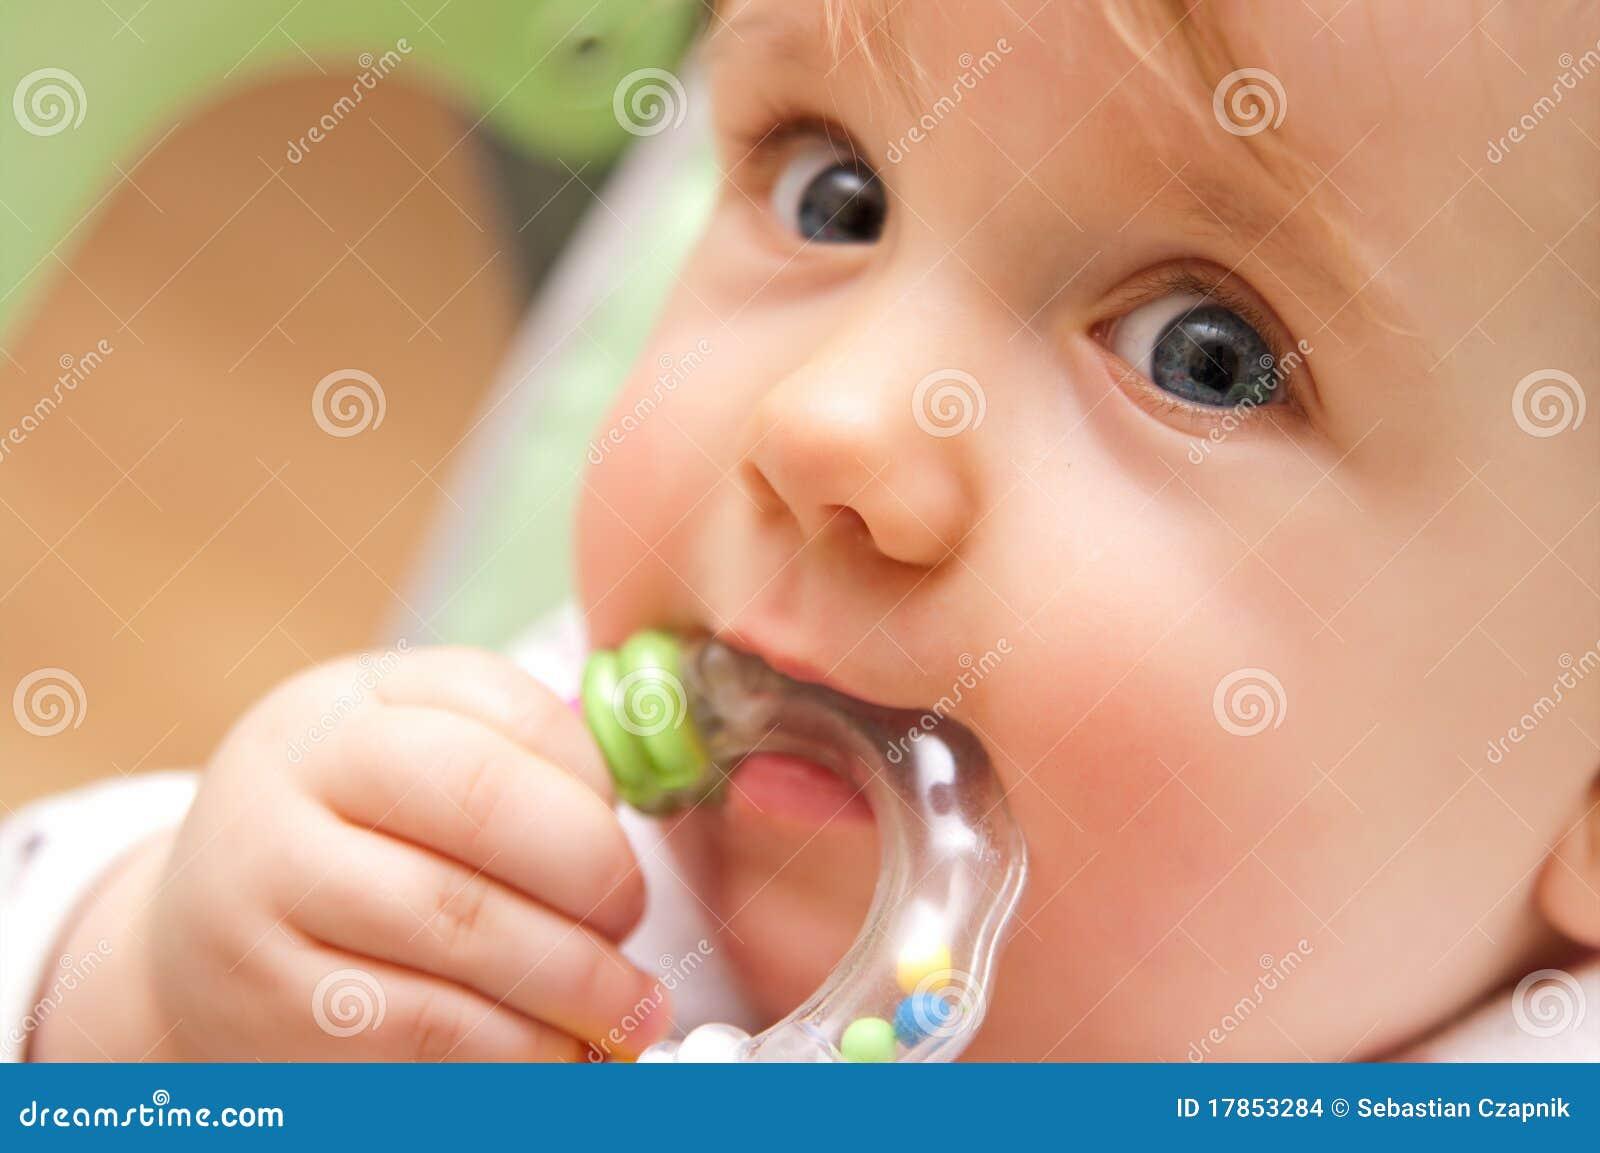 Baby girl biting toy